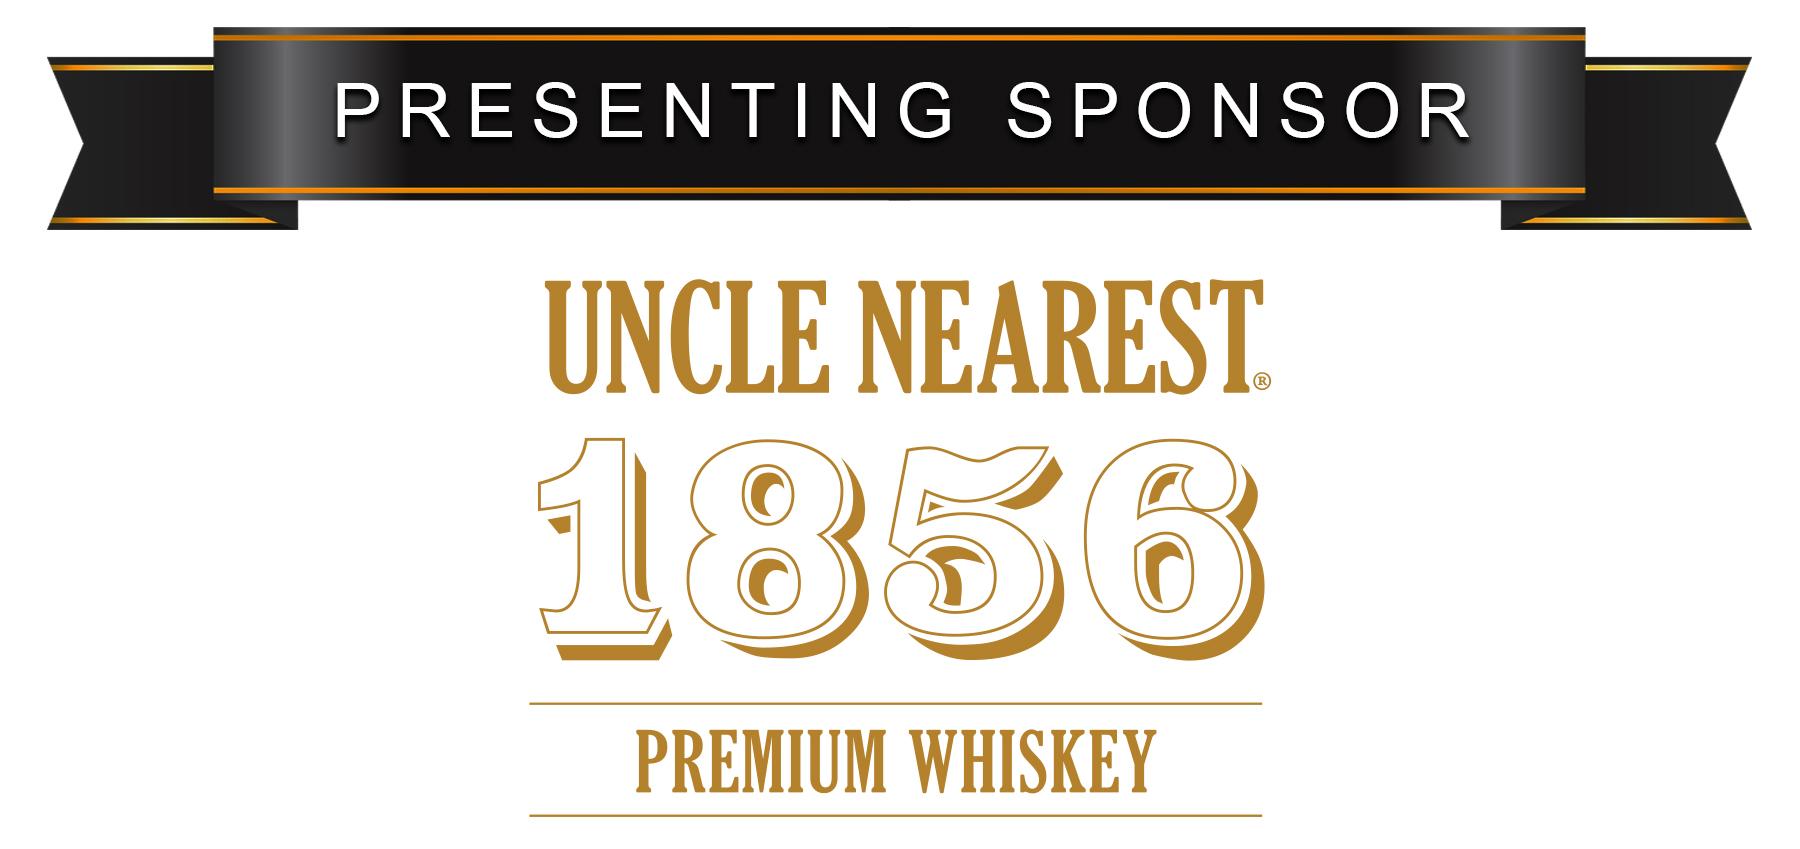 Presenting Sponsor Uncle Nearest